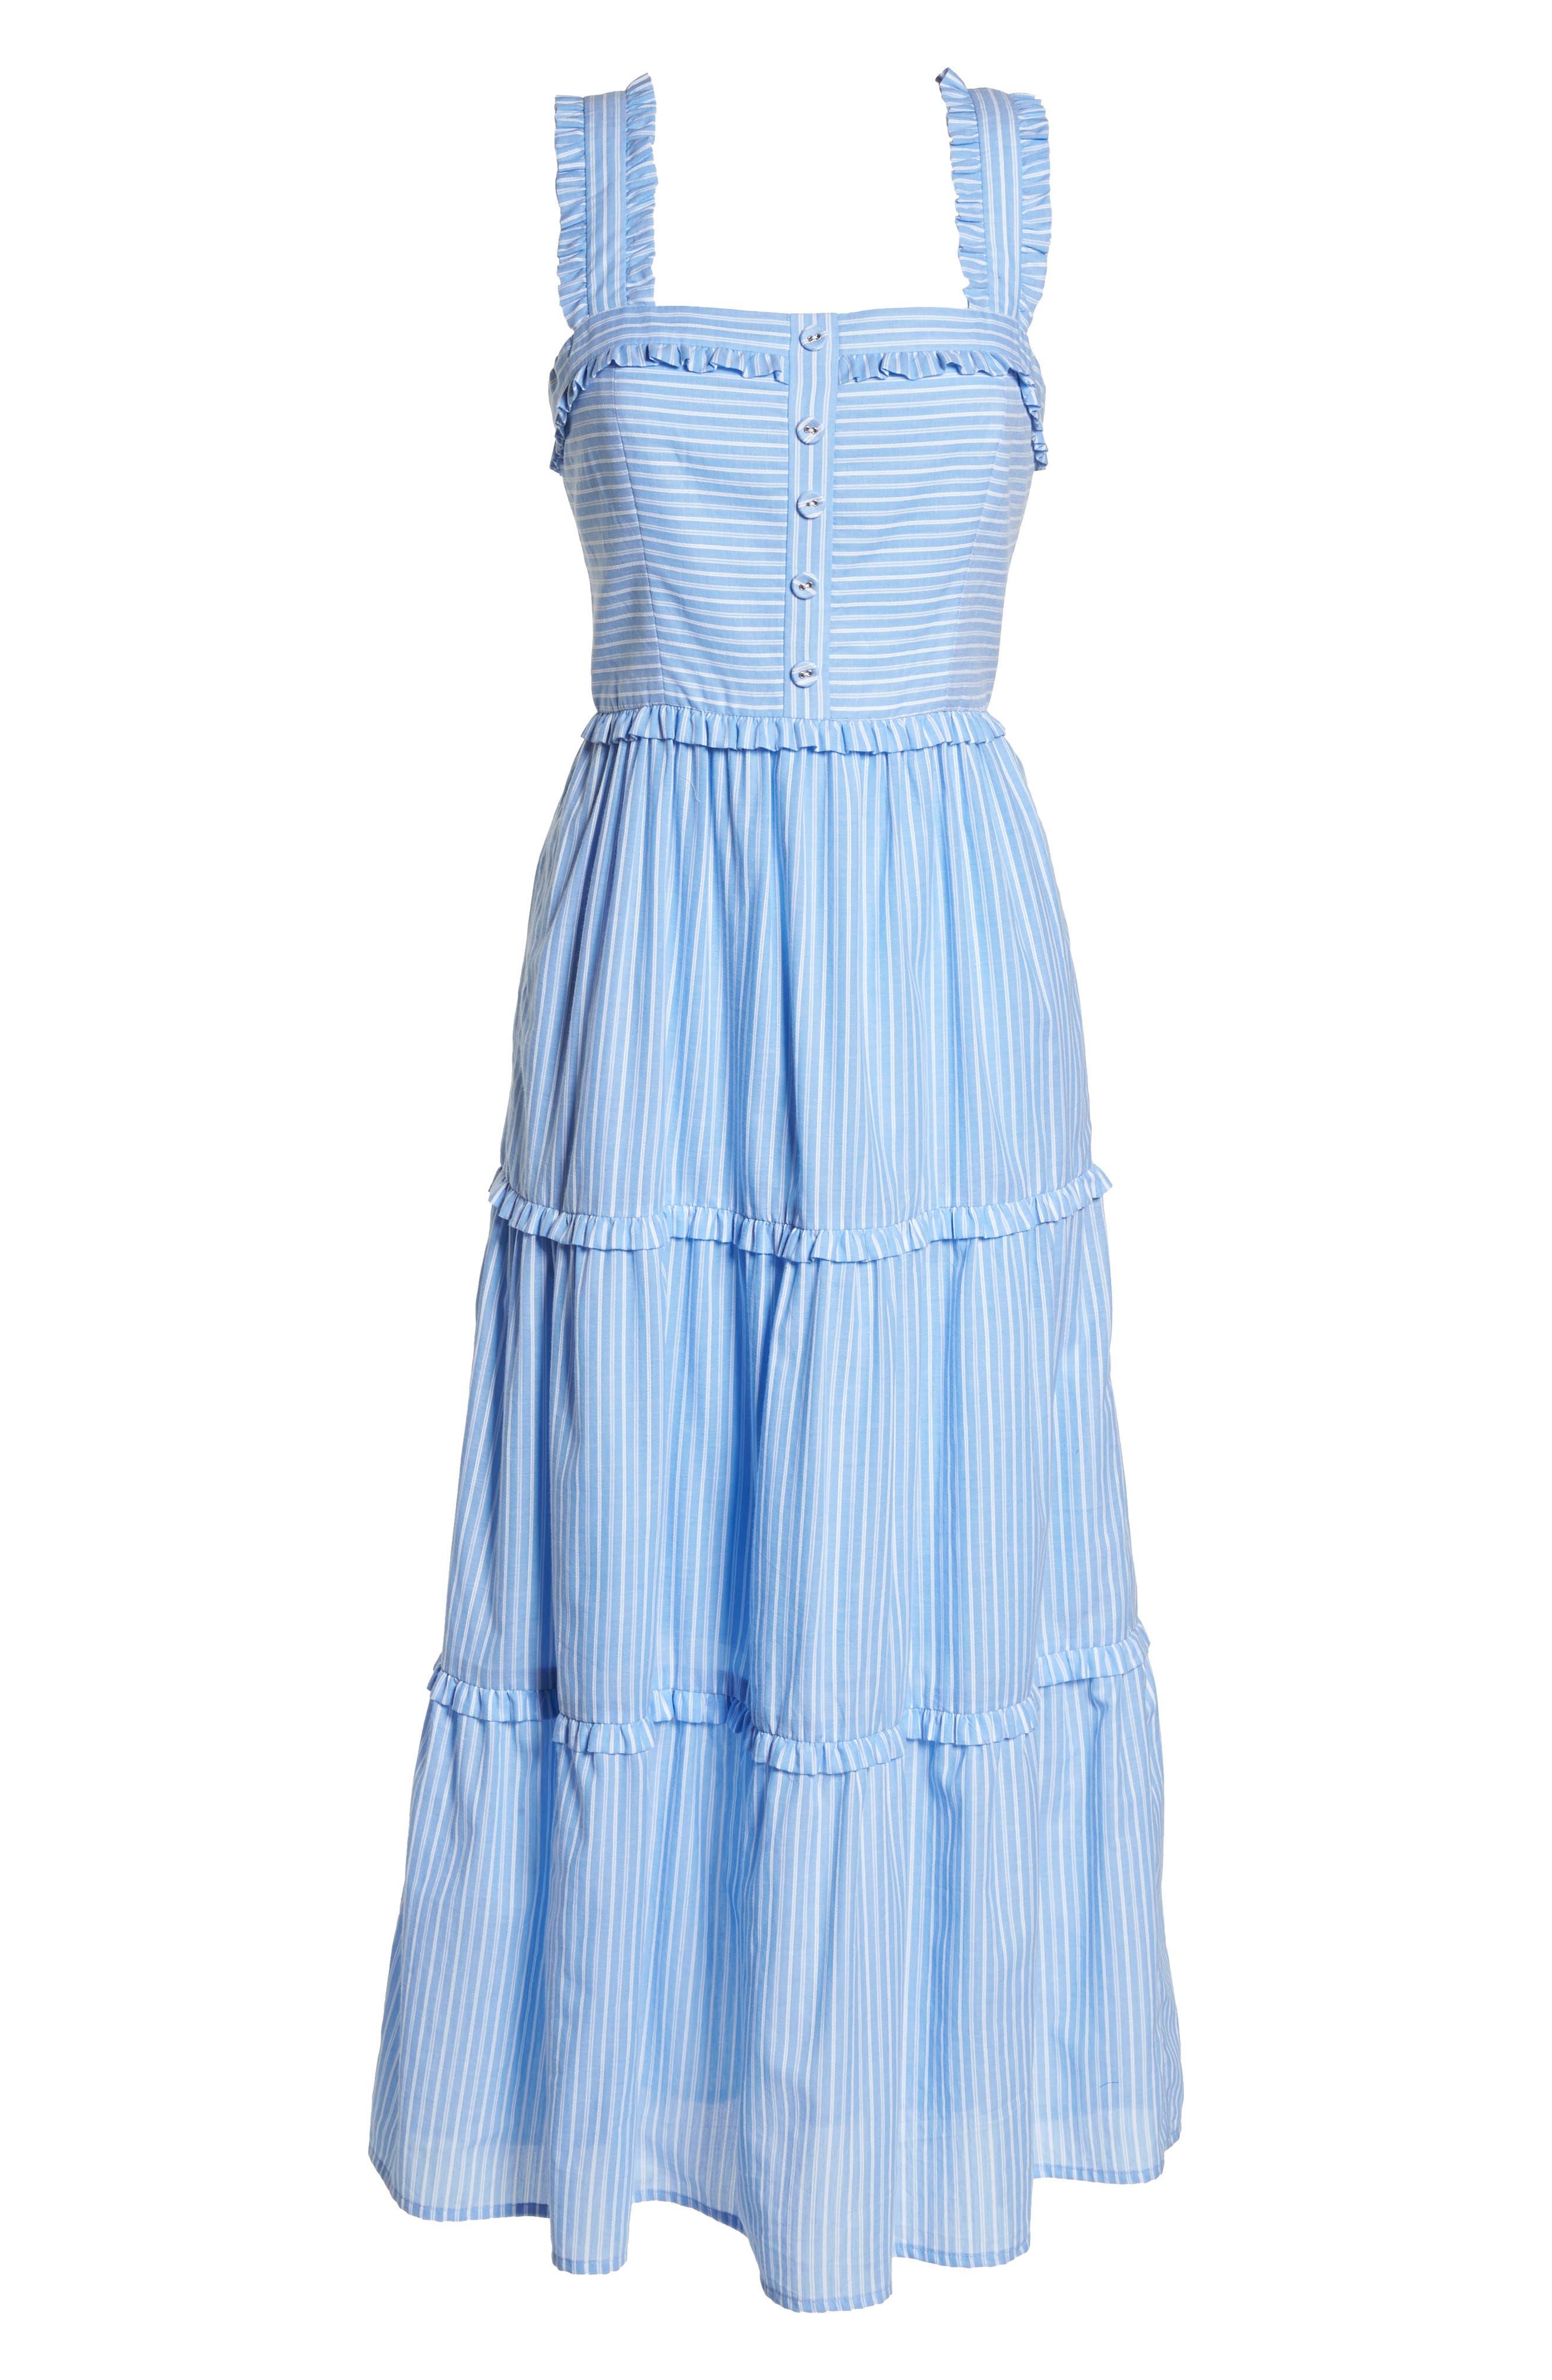 Courtney Rio Stripe Lawn Maxi Dress,                             Alternate thumbnail 8, color,                             Blue/ White